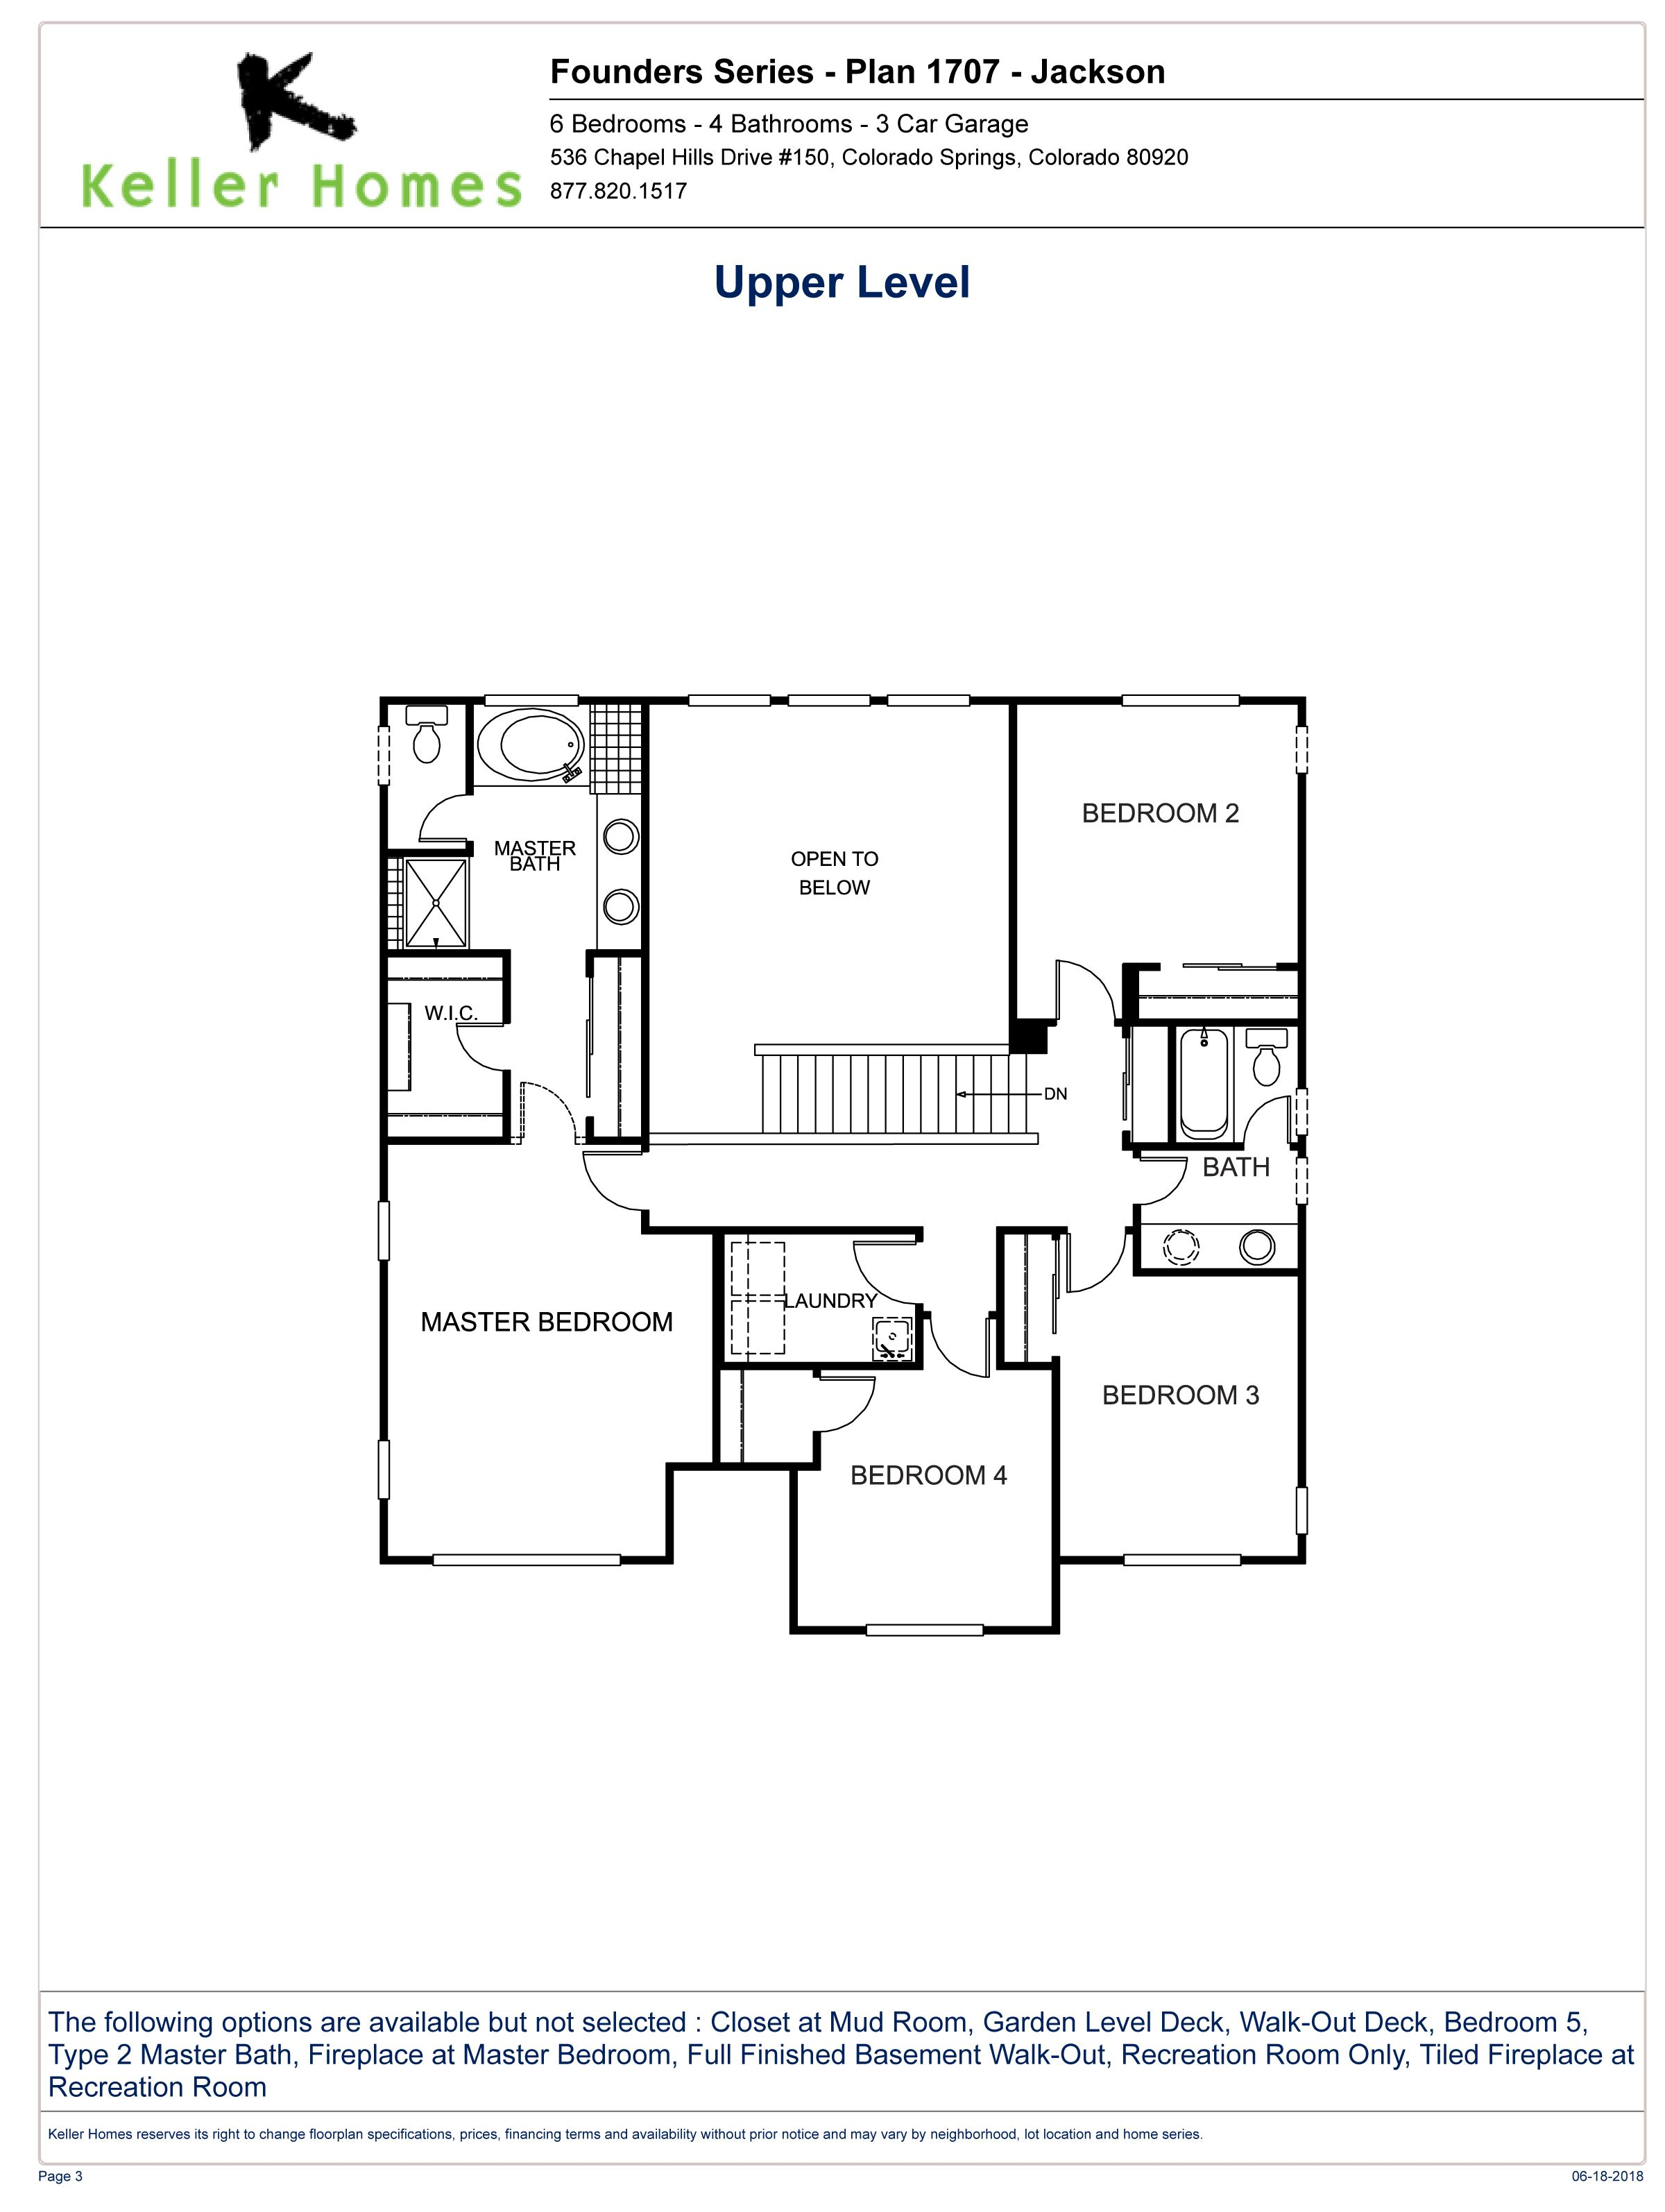 Upper Level Floorplan Jackson Floor Plans How To Plan Jackson